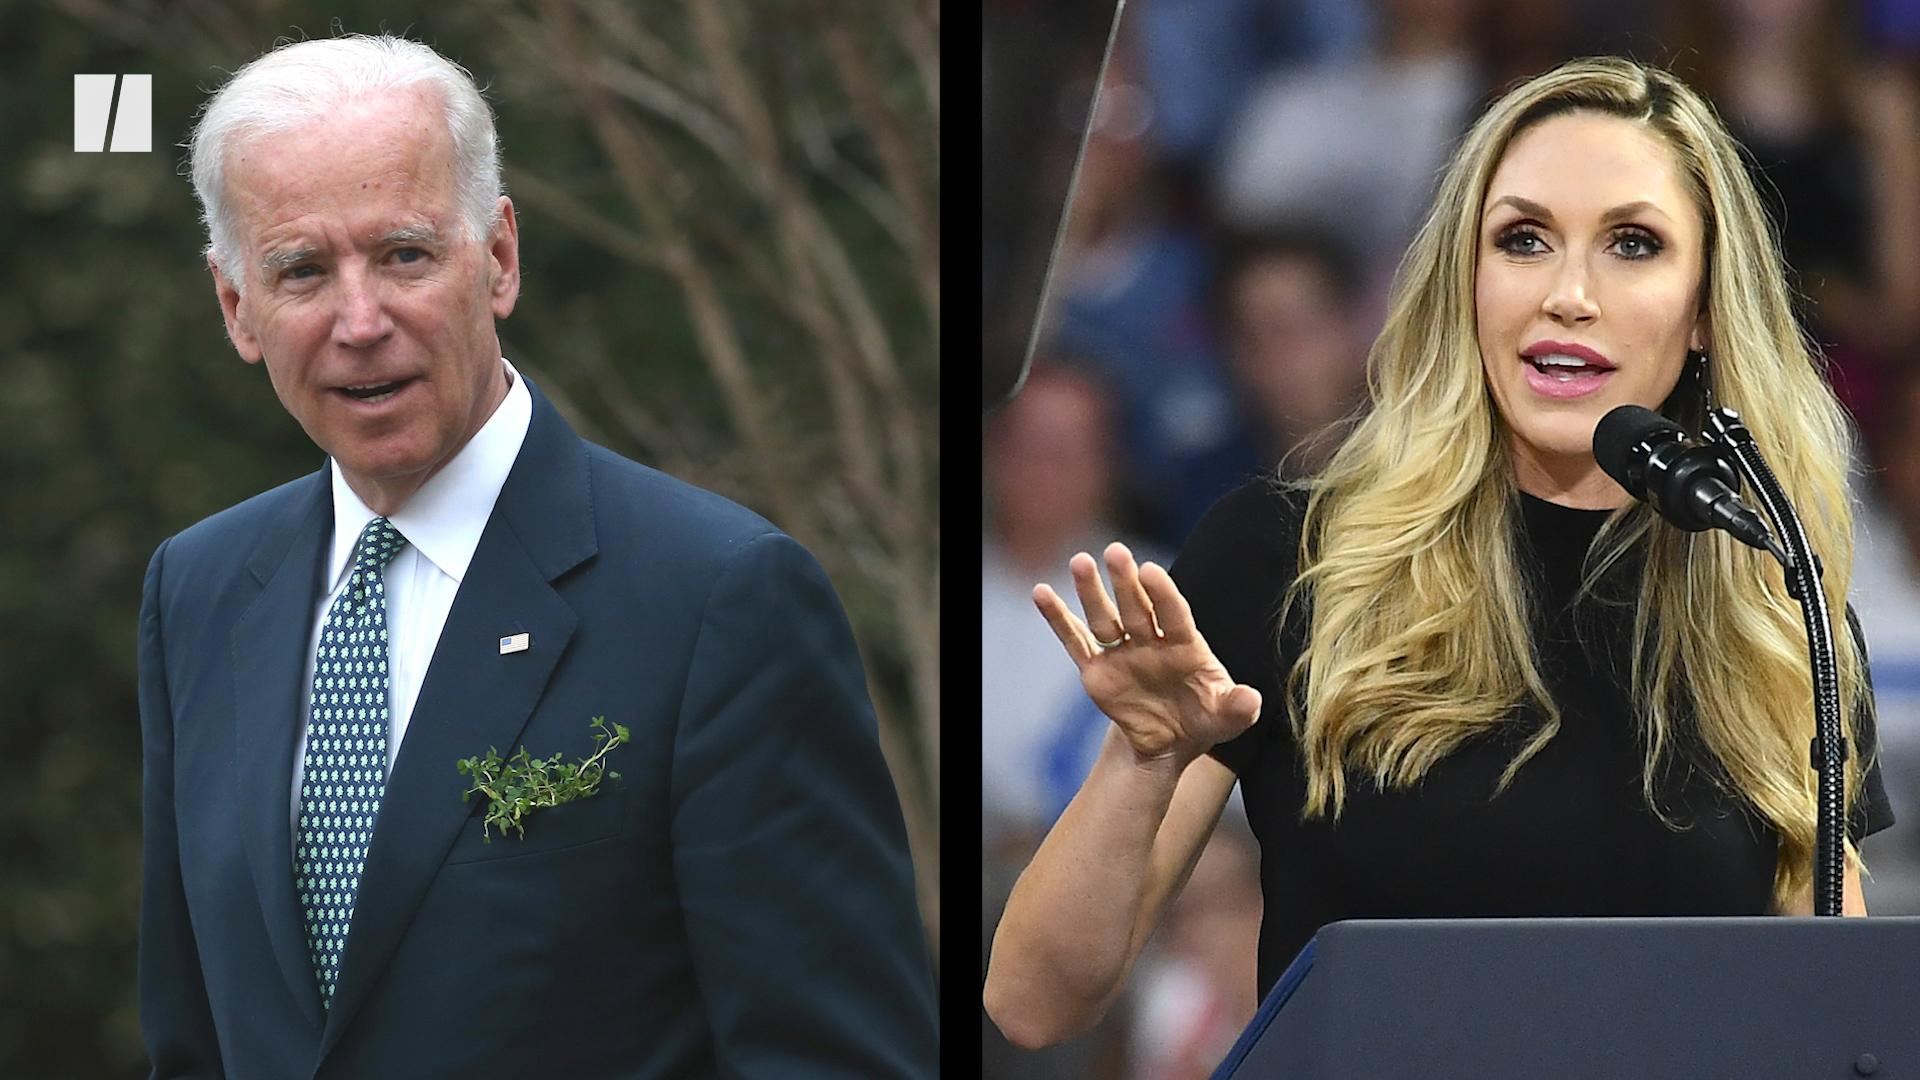 Lara Trump mocks Joe Biden for speech impediment: 'Let's get the words out'